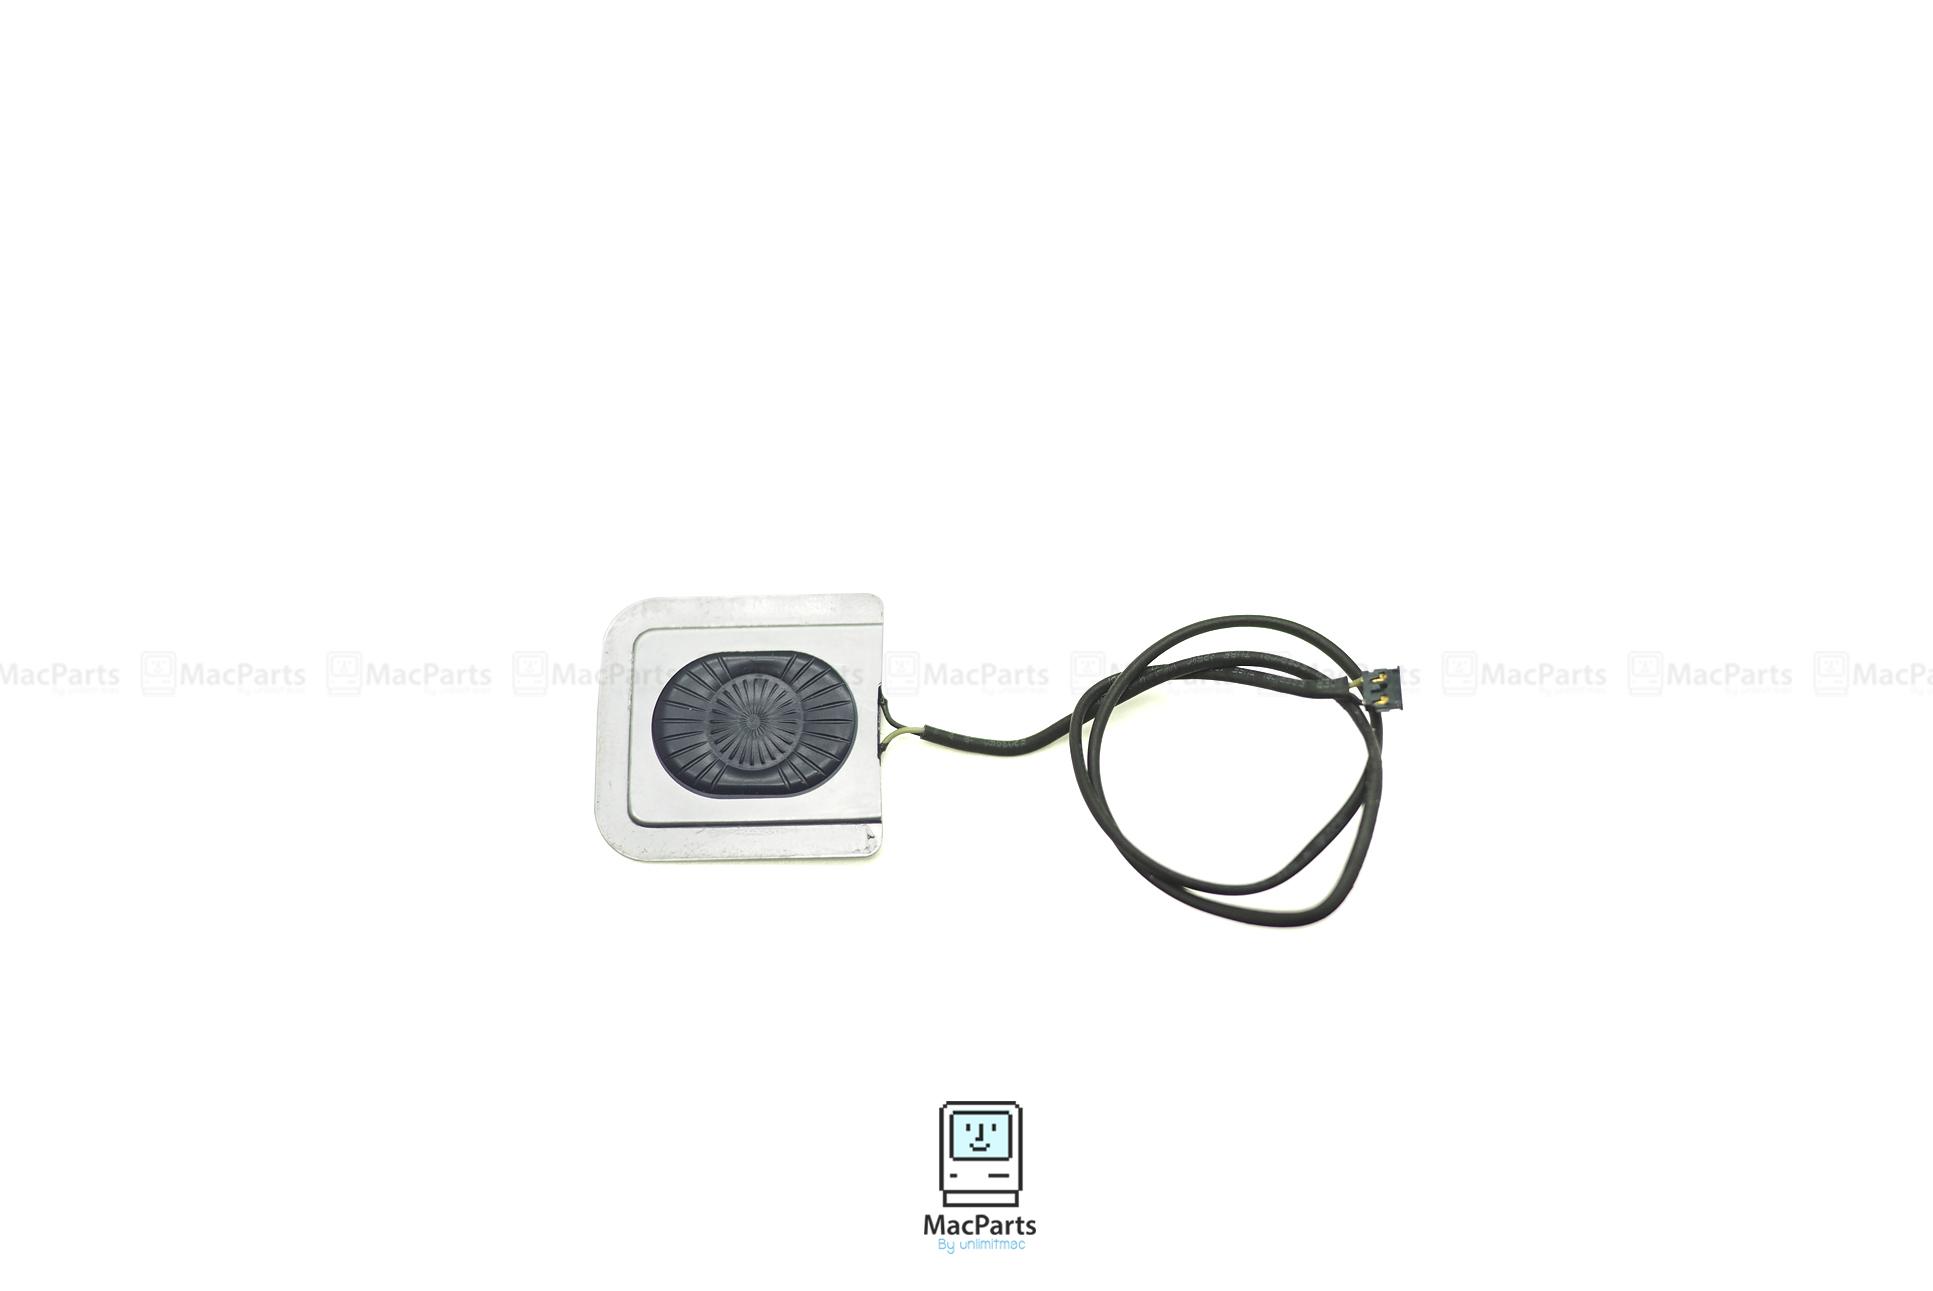 MacBook White Unibody Model A1342 Left Speaker Used , ลำโพงซ้ายแม็คบุ๊คไวท์ยูนิบอดี้